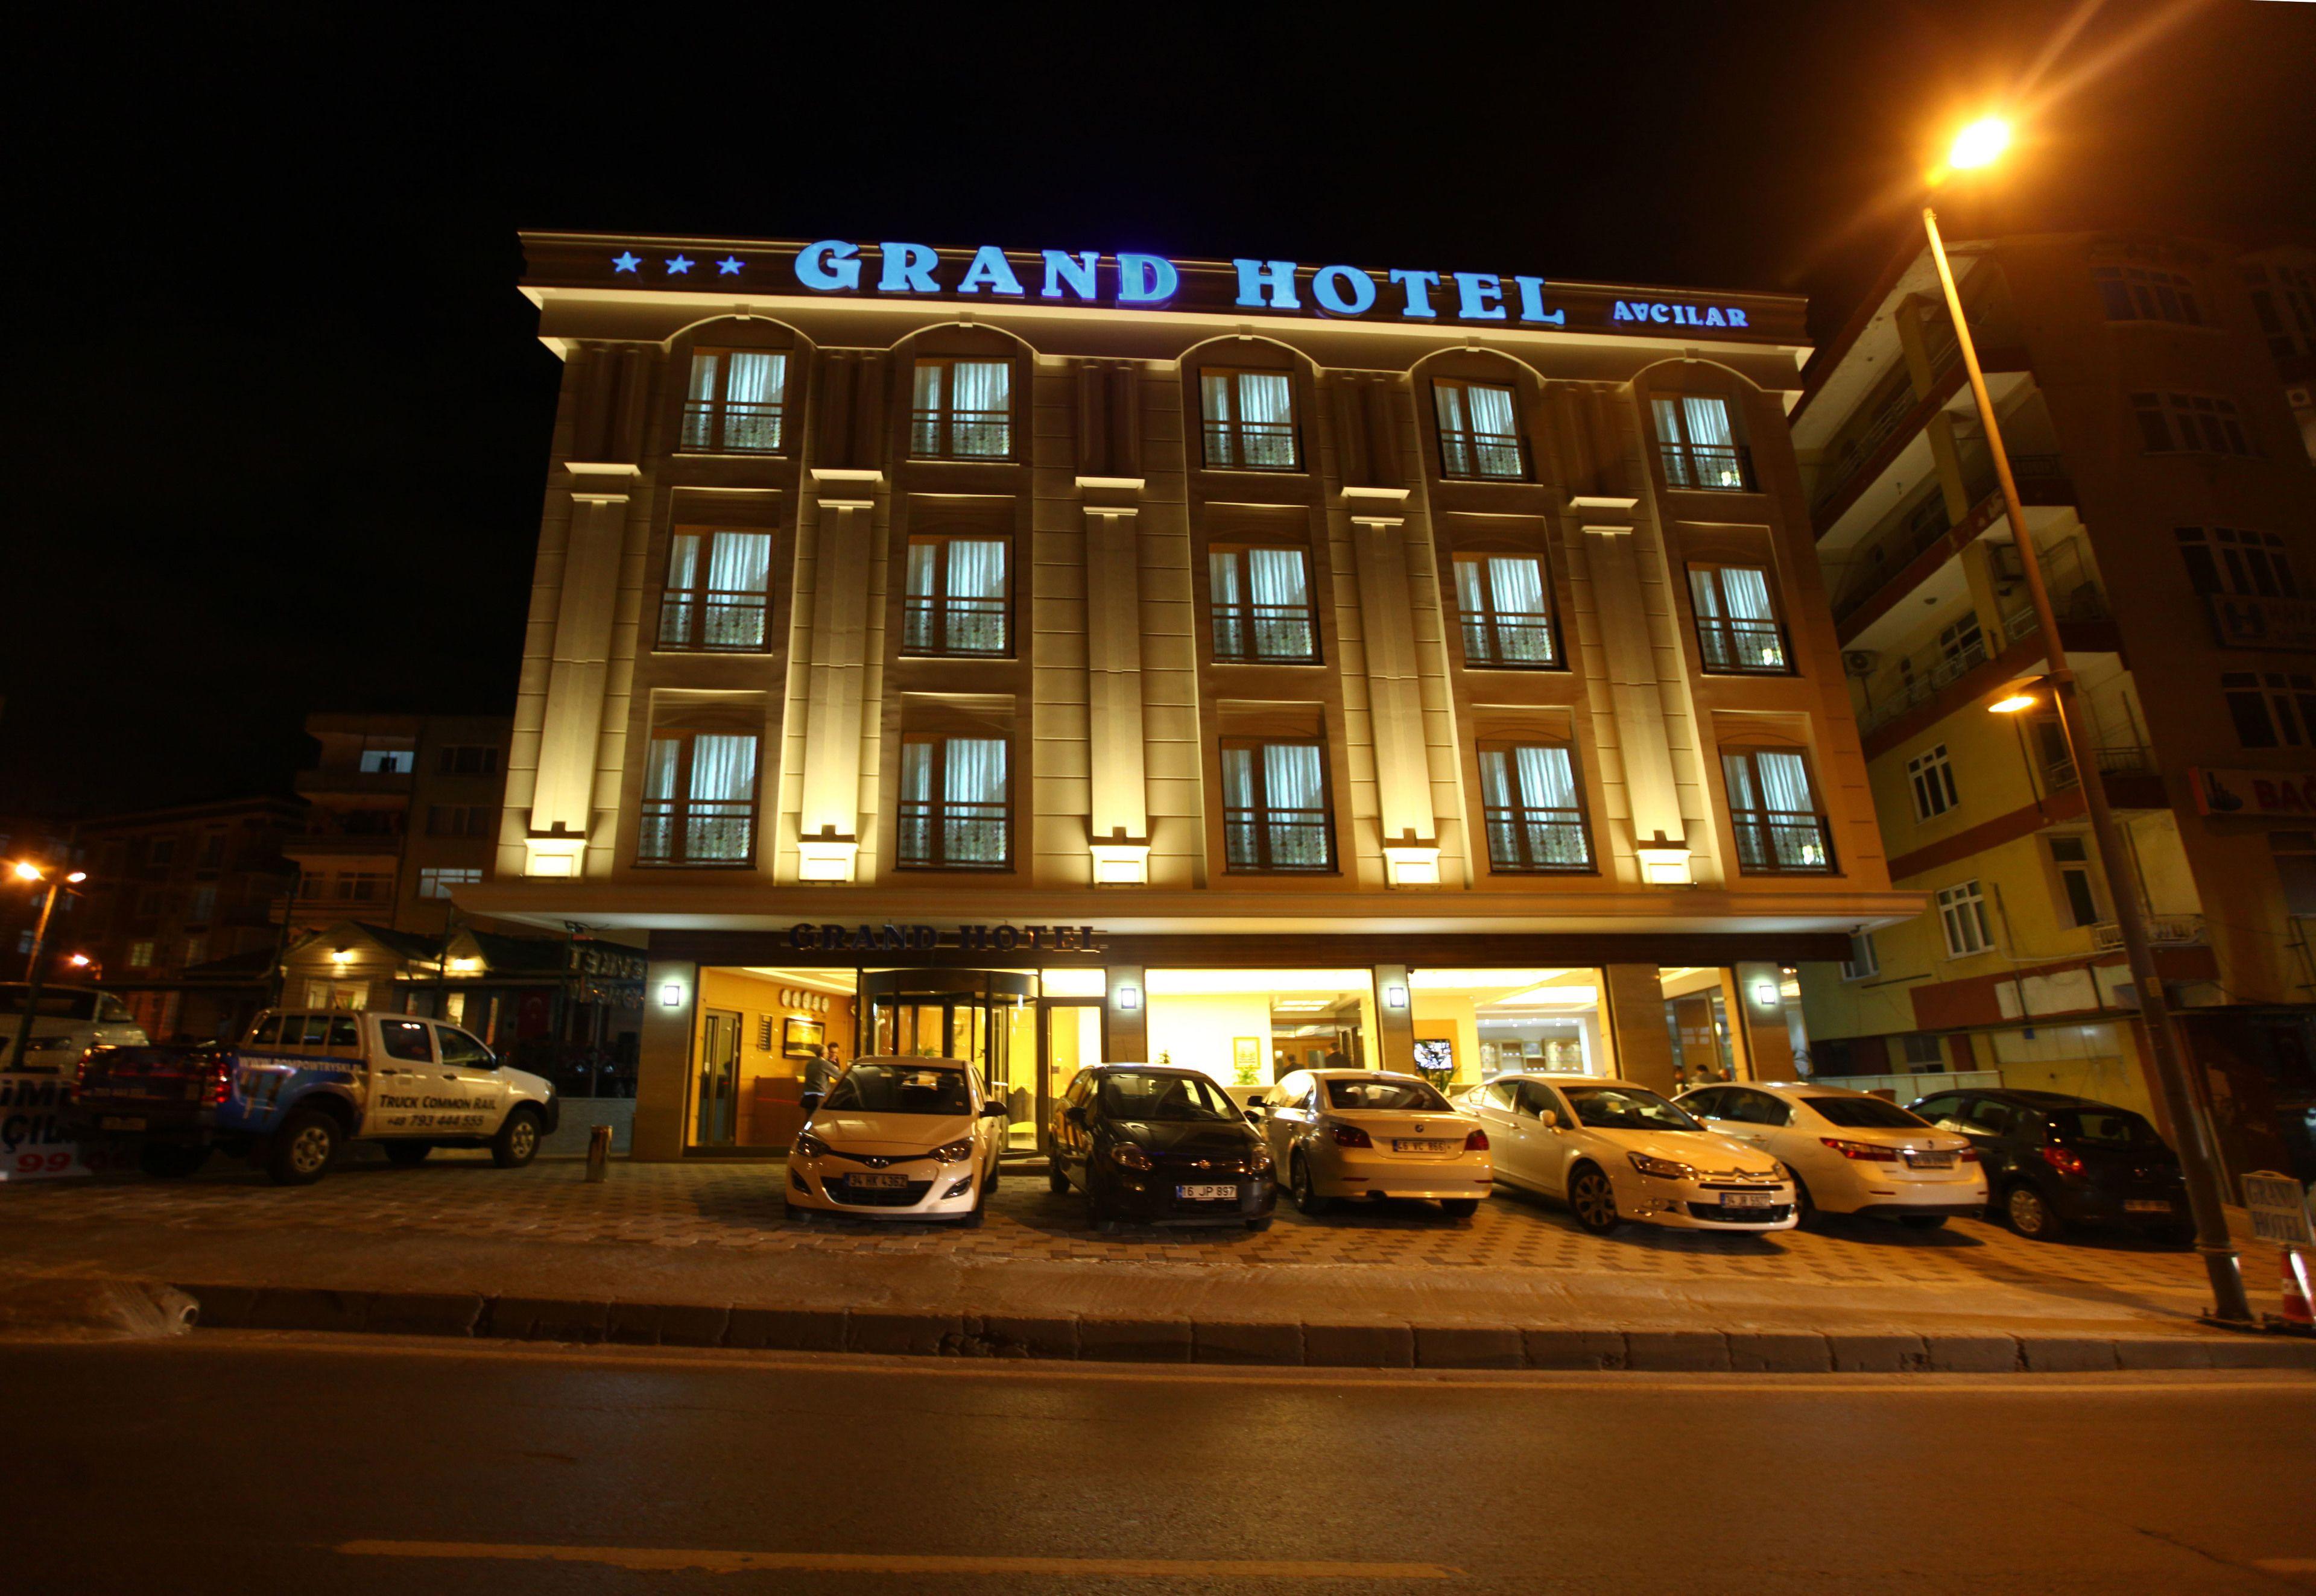 Grand Hotel Avcilar Airport